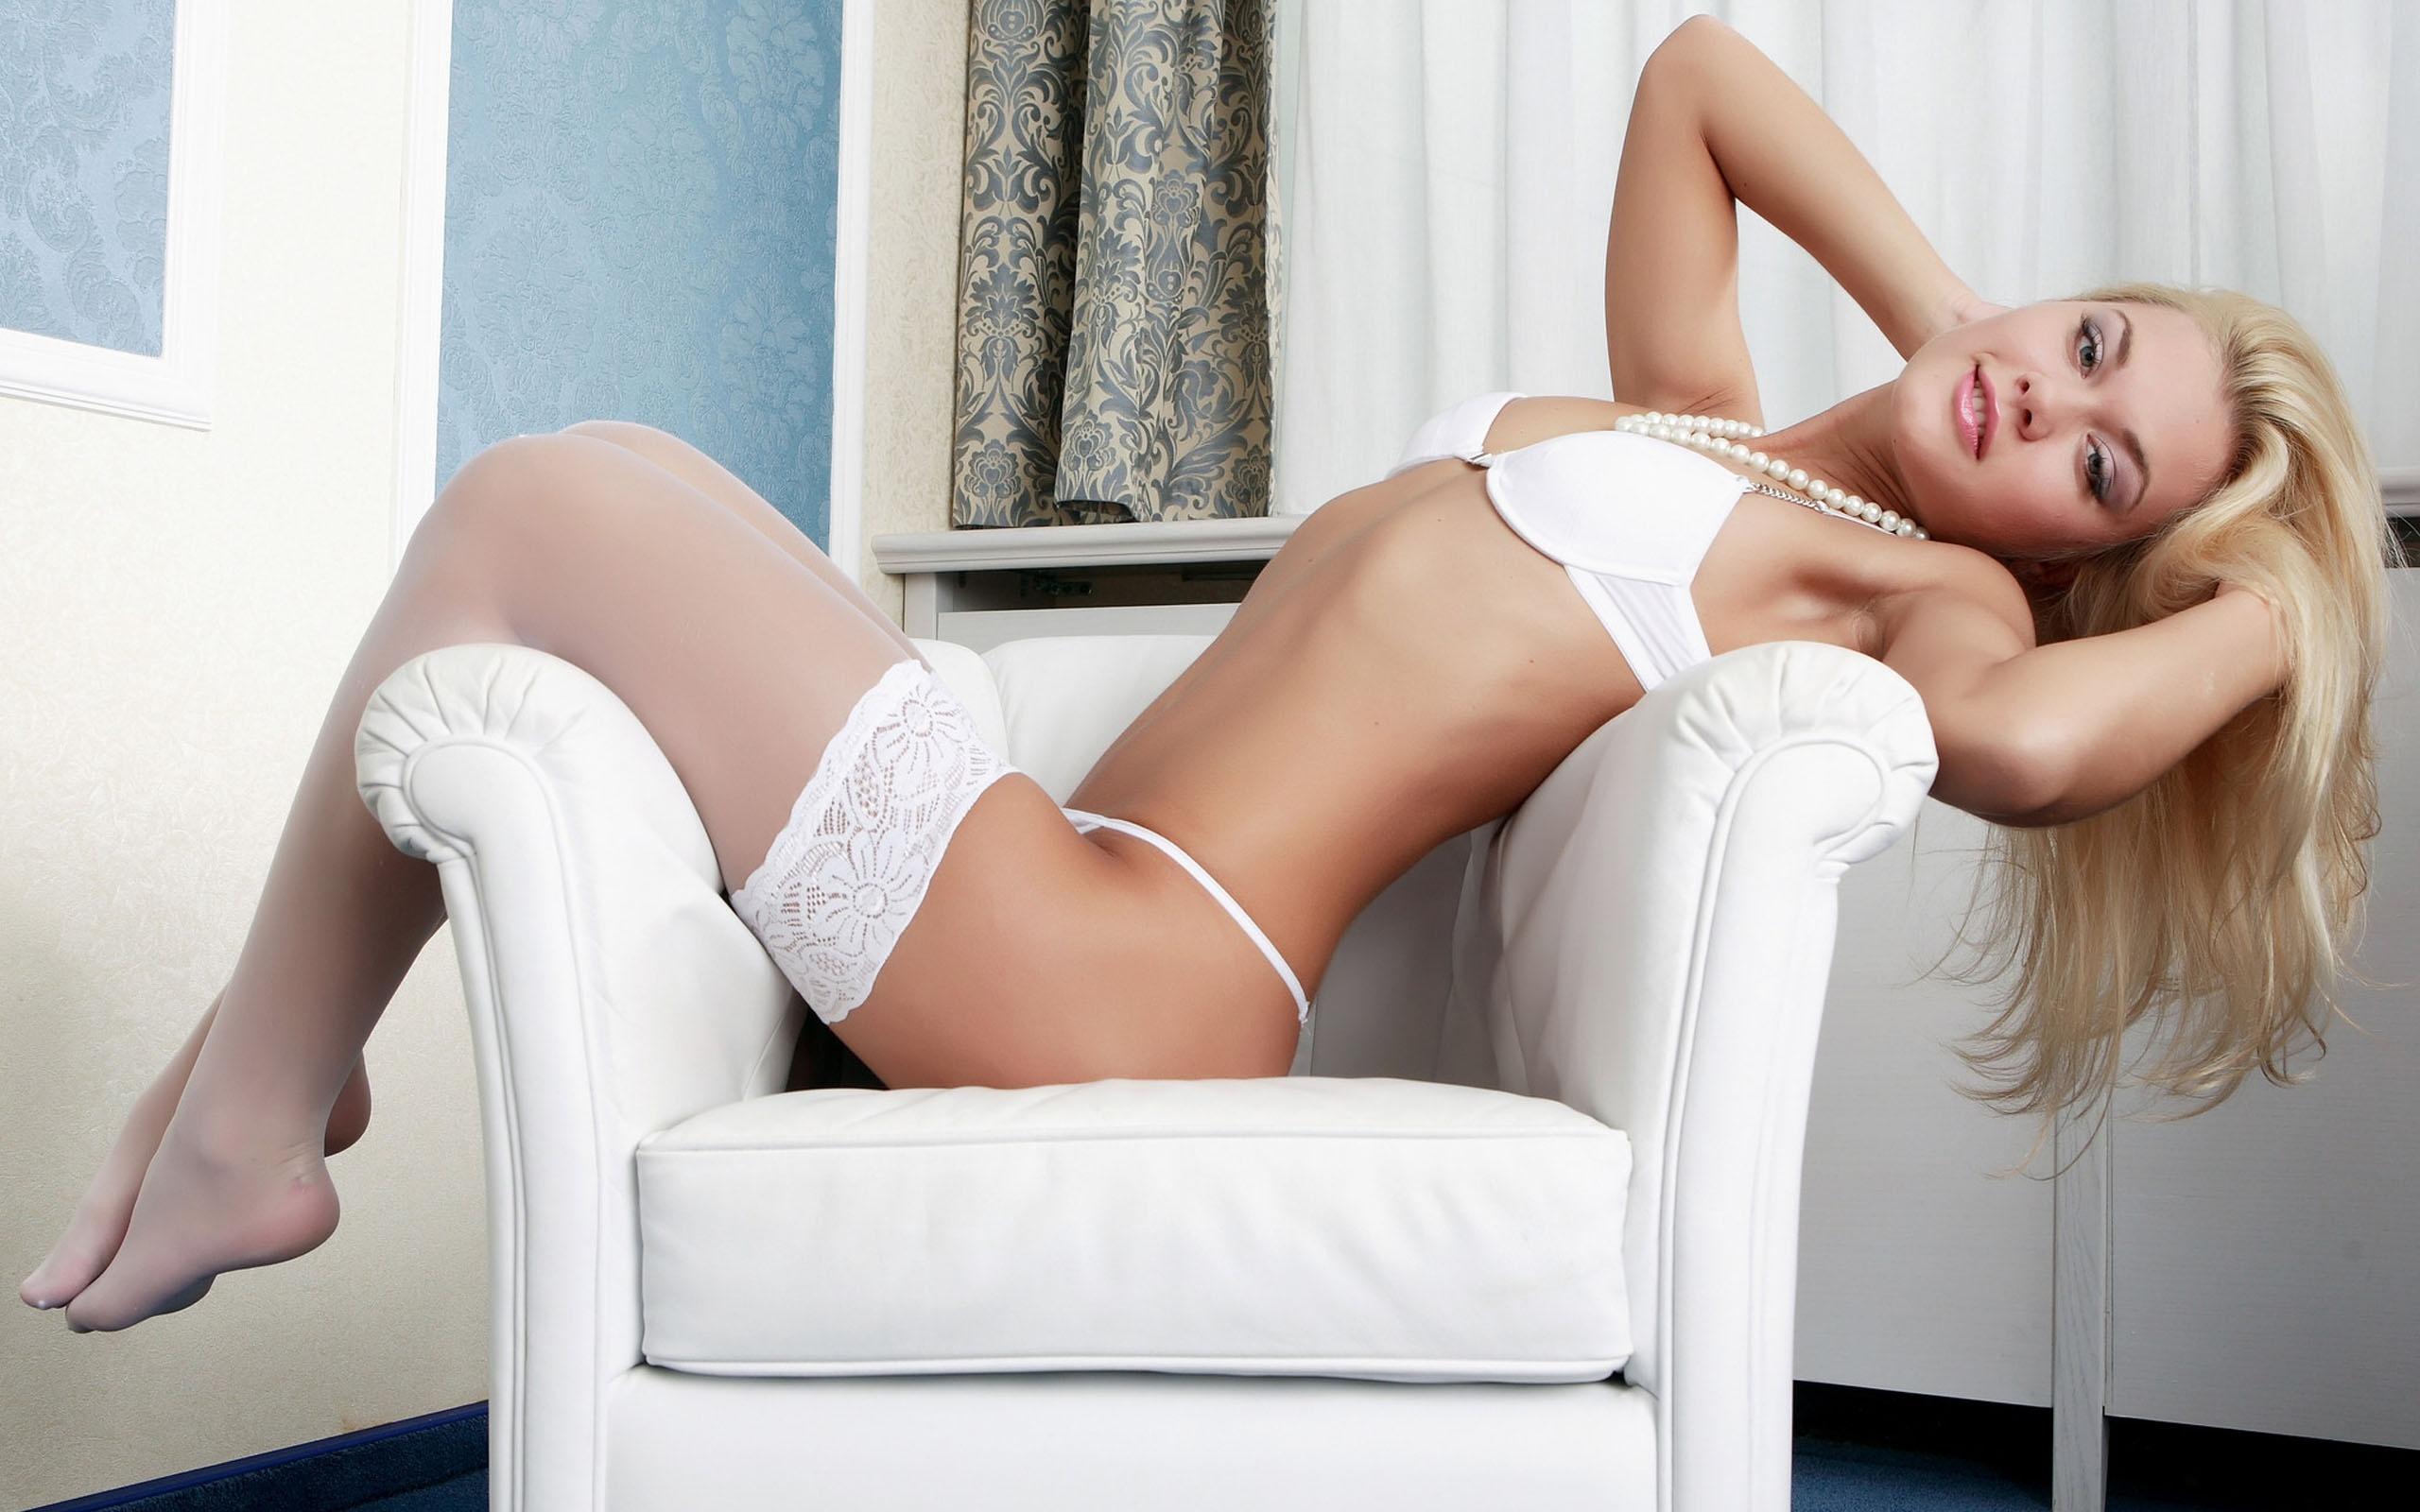 Dark haired solo girl Nadia Capri shedding pink teddy on lounge chair in yard  588793